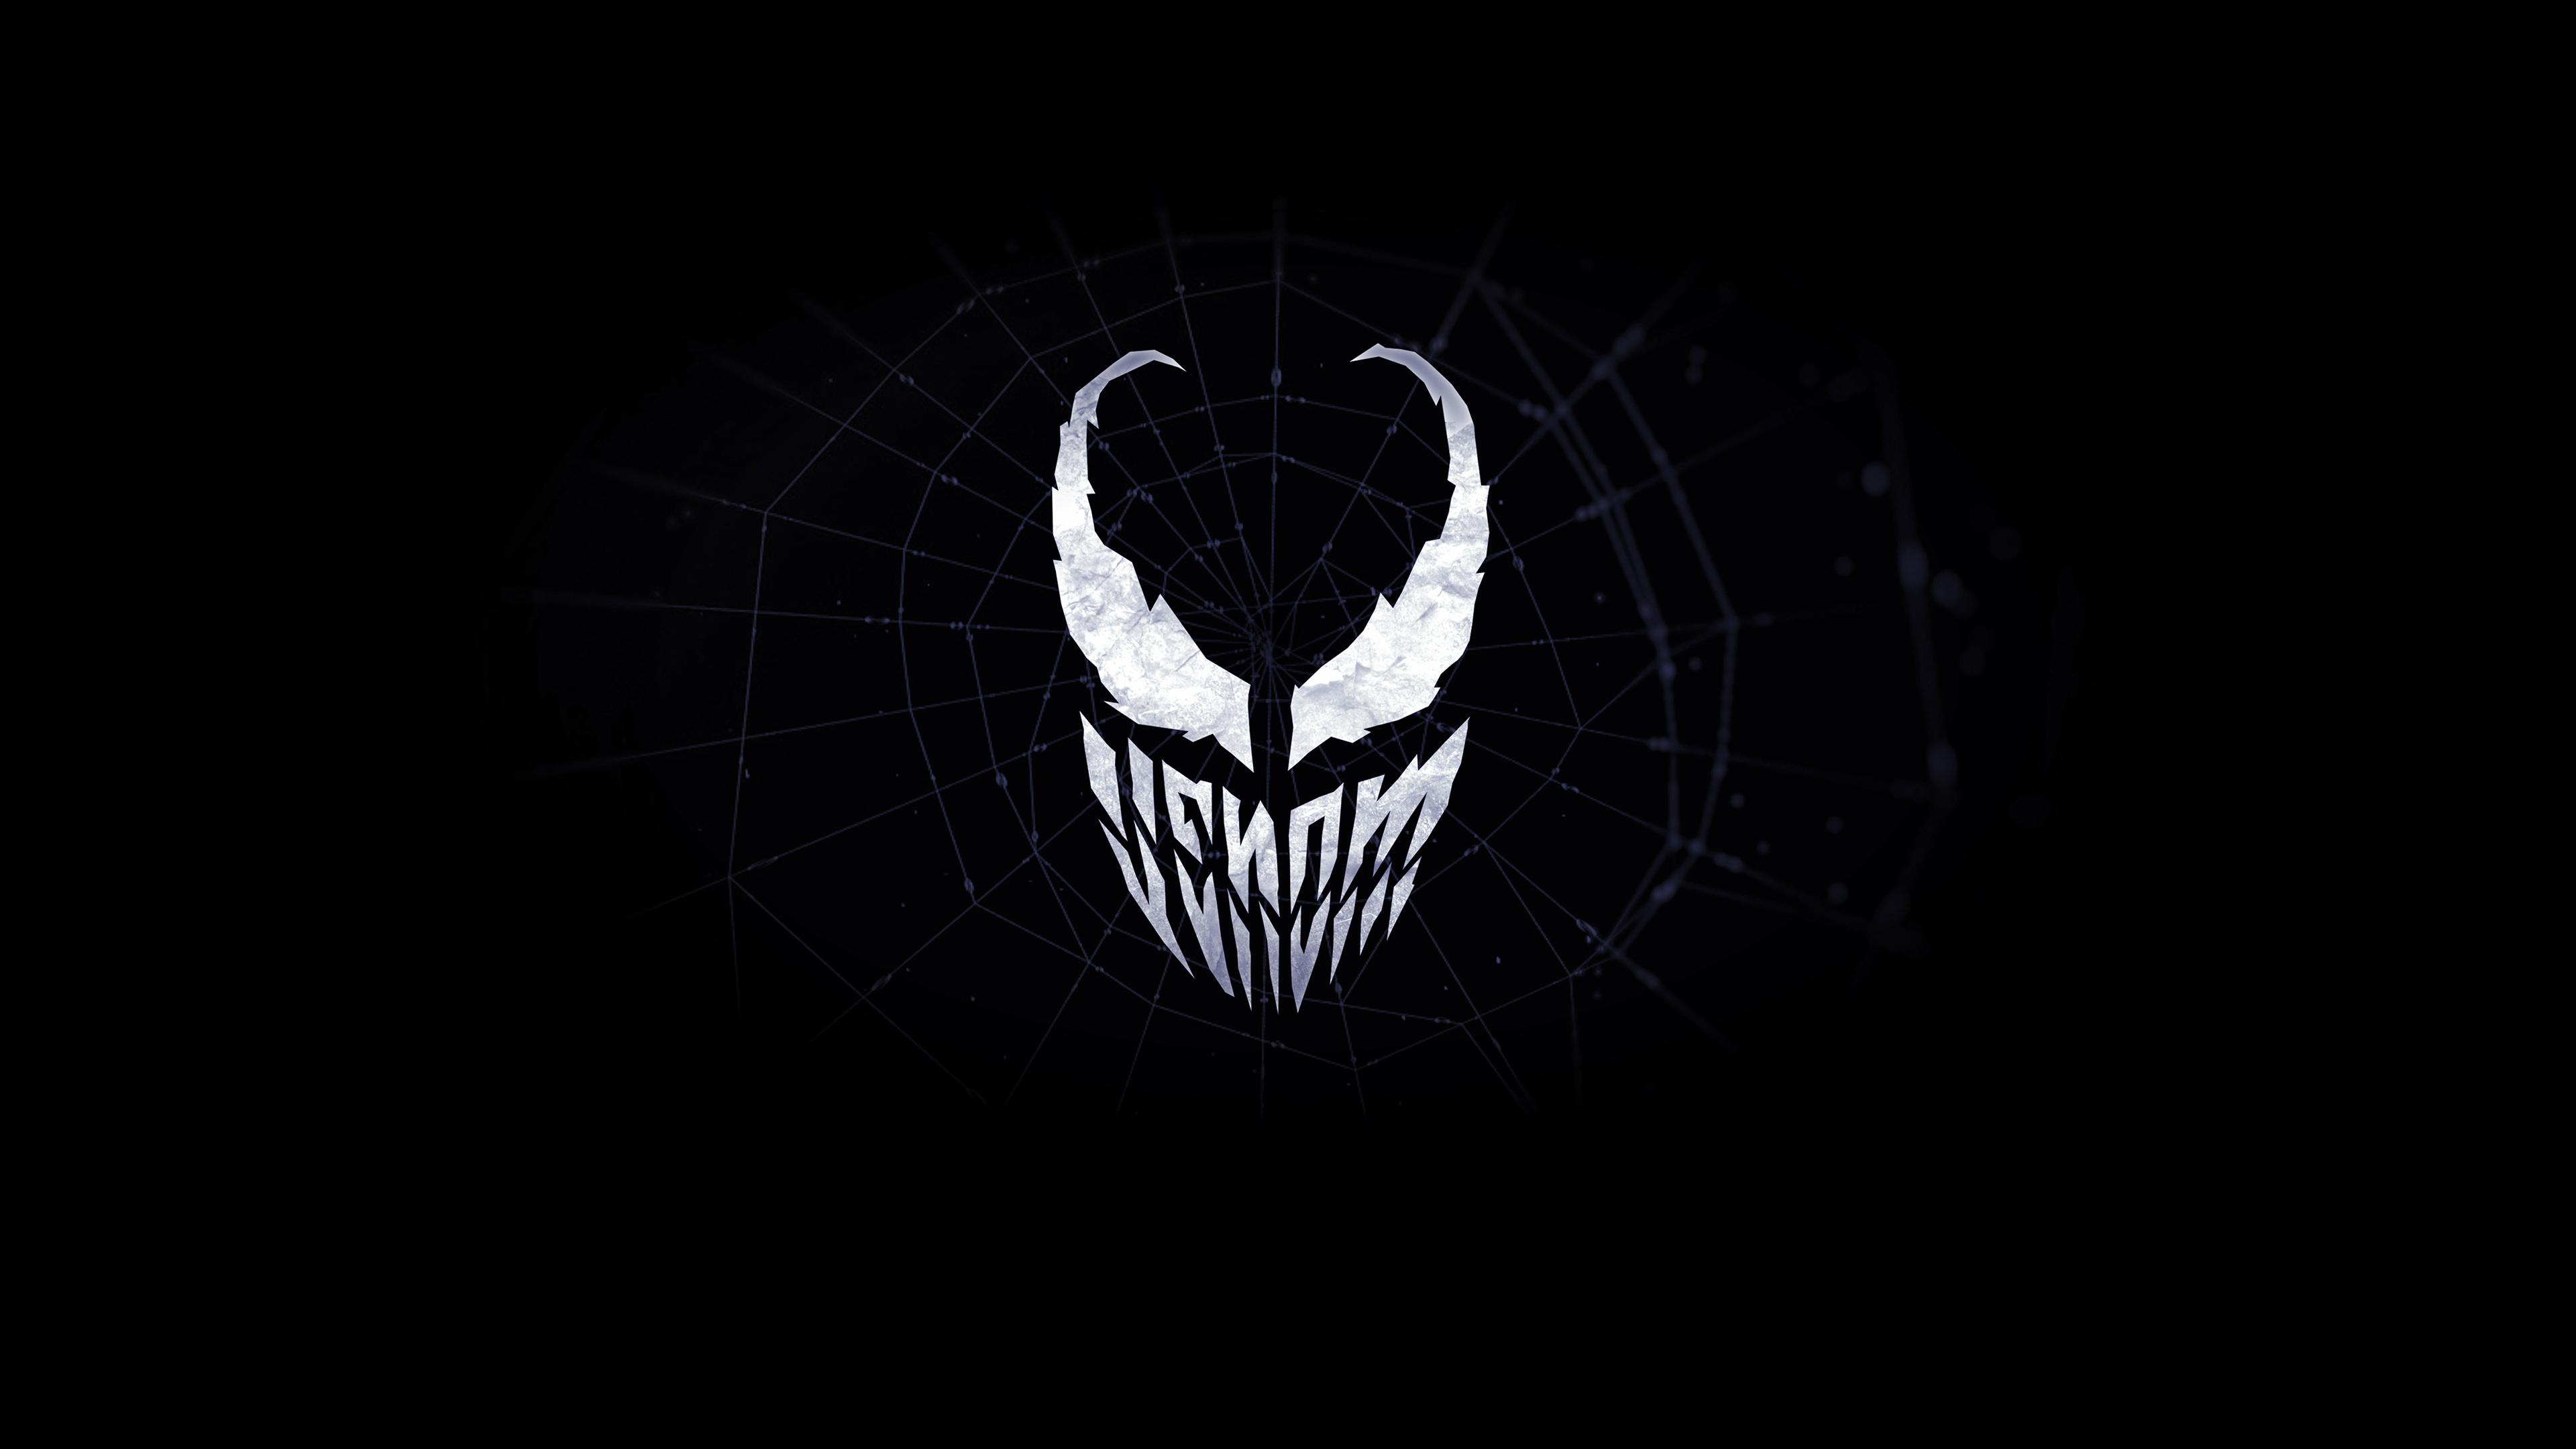 venom minimalist logo 4k 1553069905 - Venom Minimalist Logo 4k - Venom wallpapers, superheroes wallpapers, minimalist wallpapers, minimalism wallpapers, hd-wallpapers, digital art wallpapers, behance wallpapers, artwork wallpapers, artist wallpapers, 4k-wallpapers